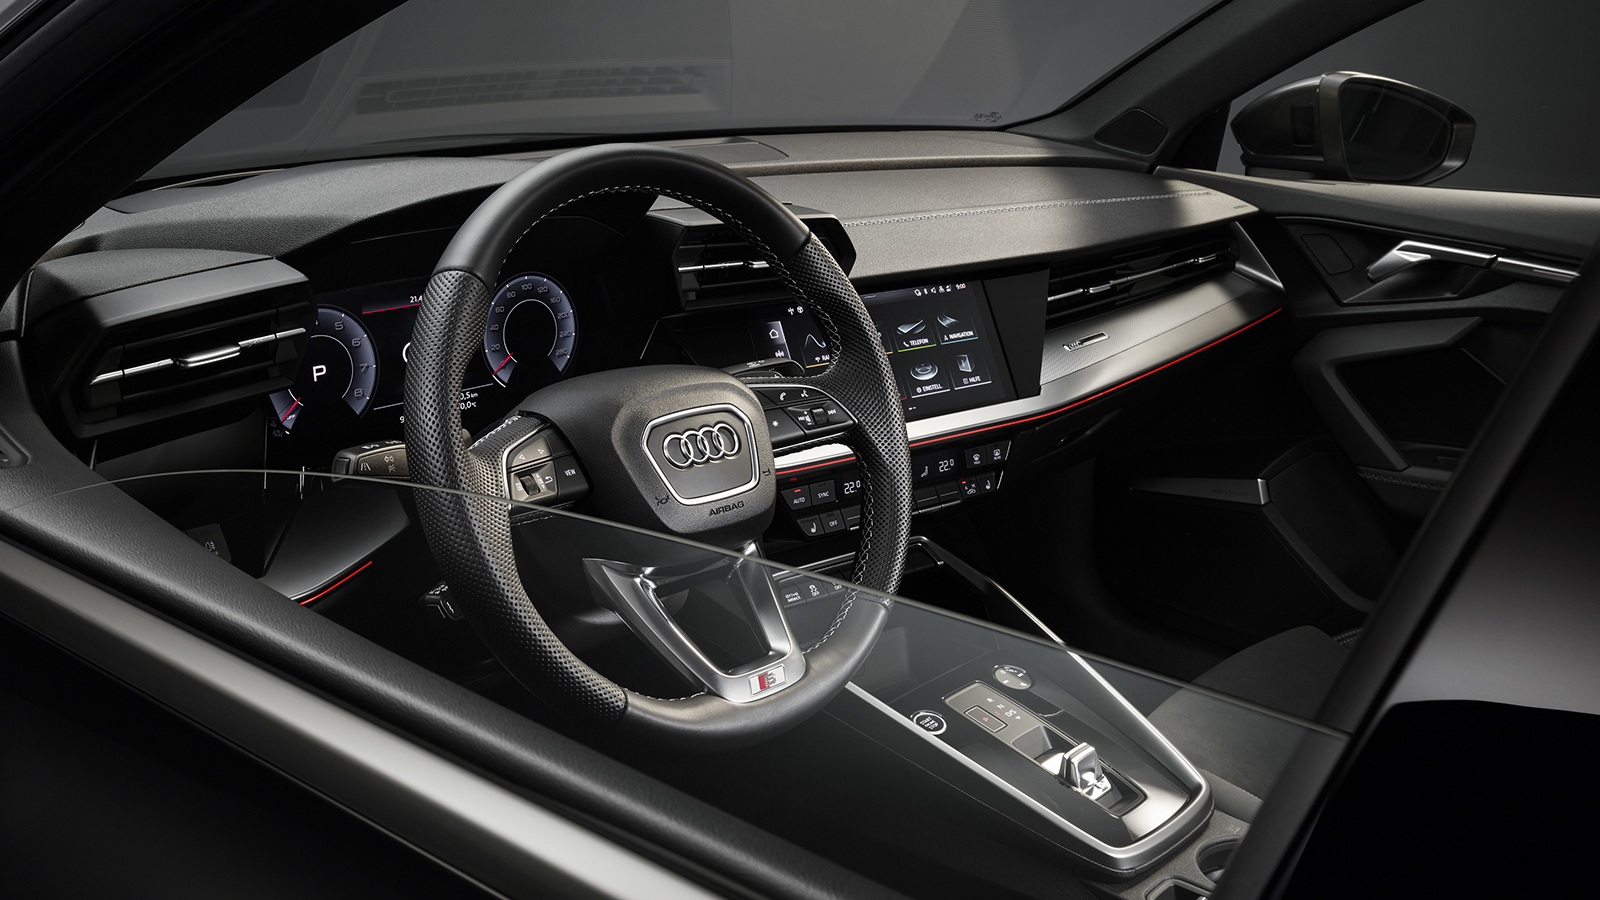 Audi A3 Sportback France 333 960x480 photo